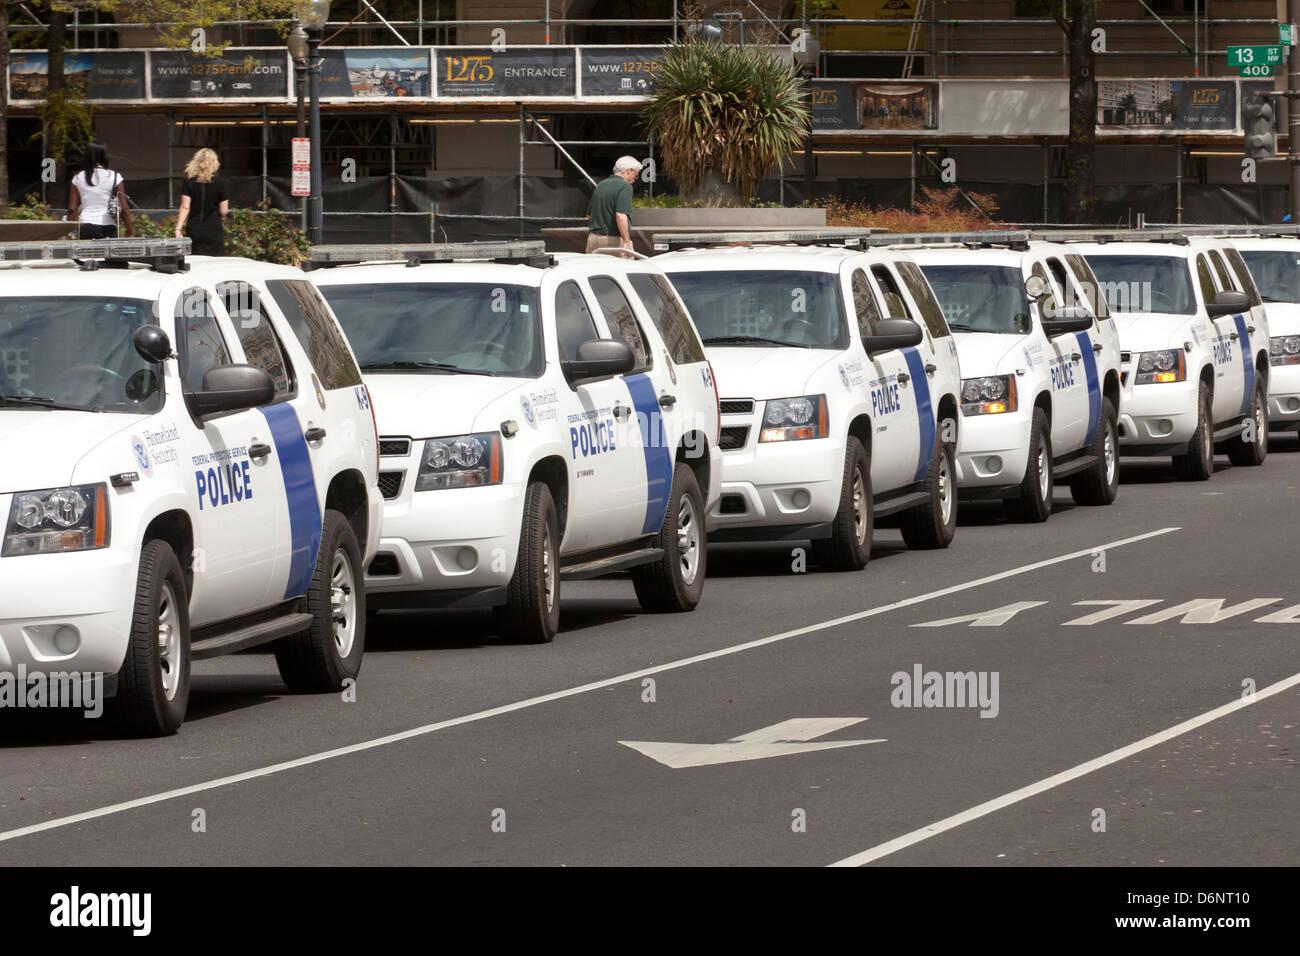 Homeland Security police vehicles lined up - Washington, DC USA - Stock Image